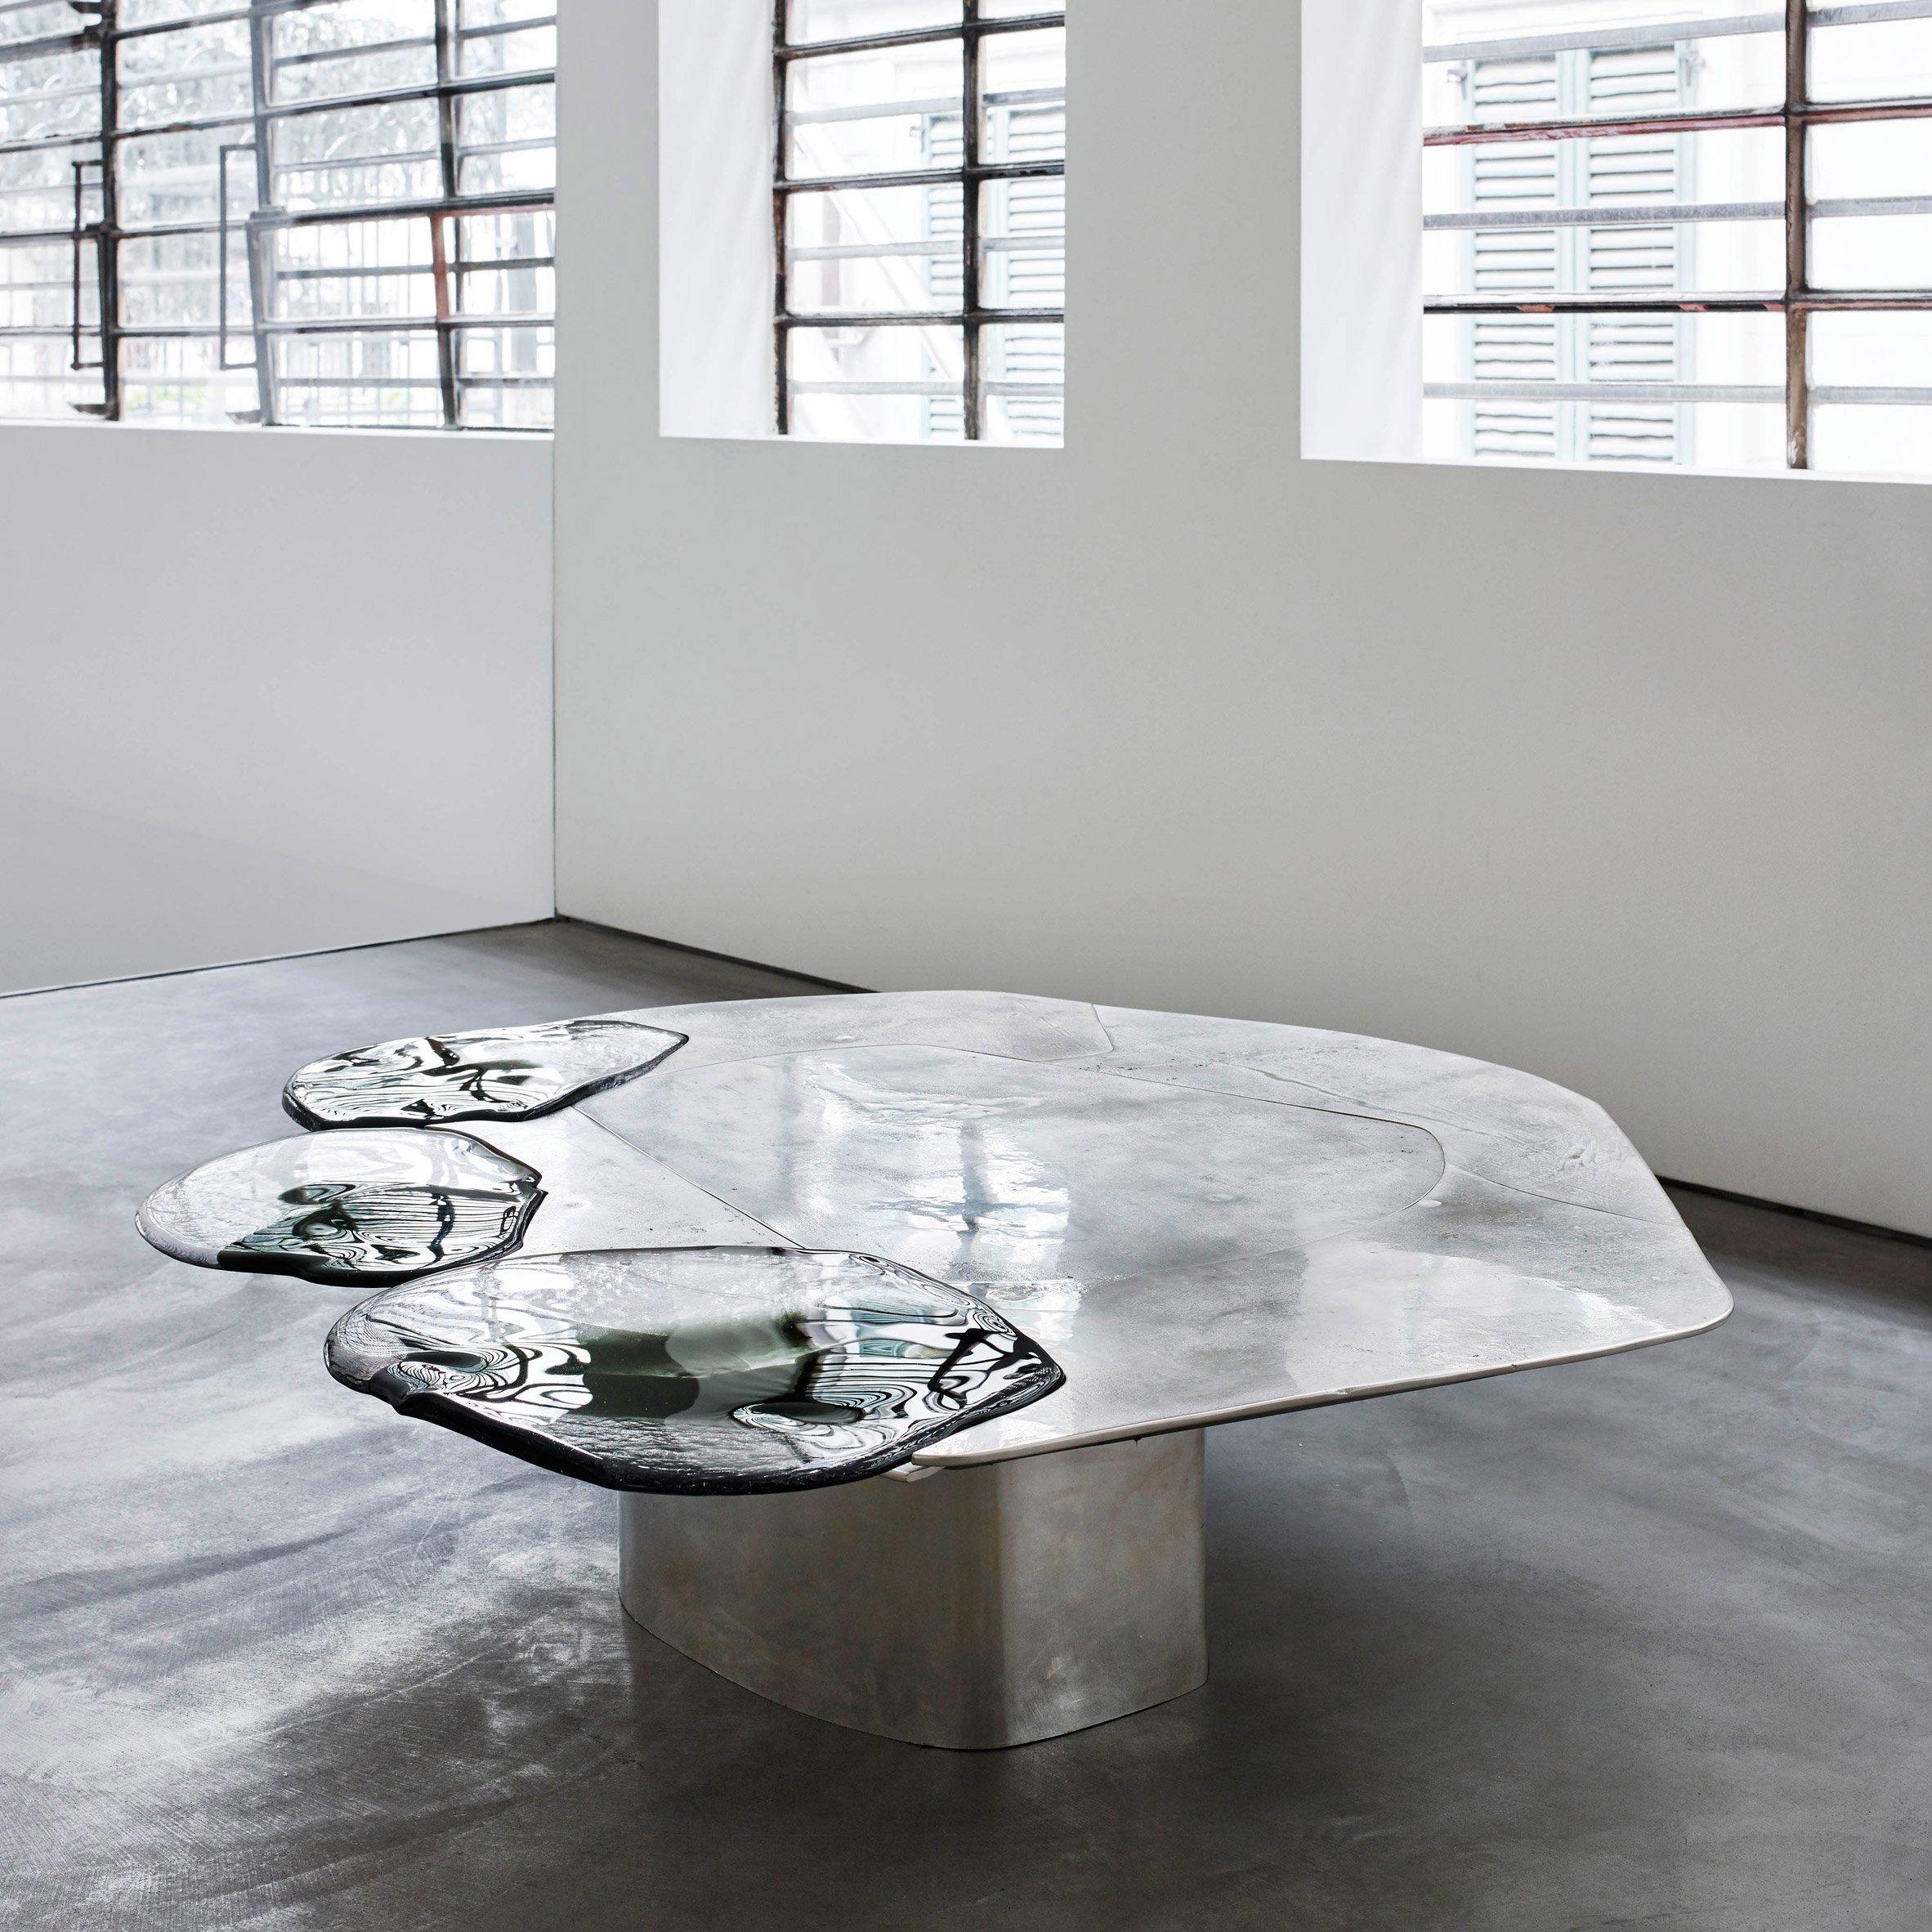 Pools of metal and glass form vincenzo de cotiis baroquisme furniture